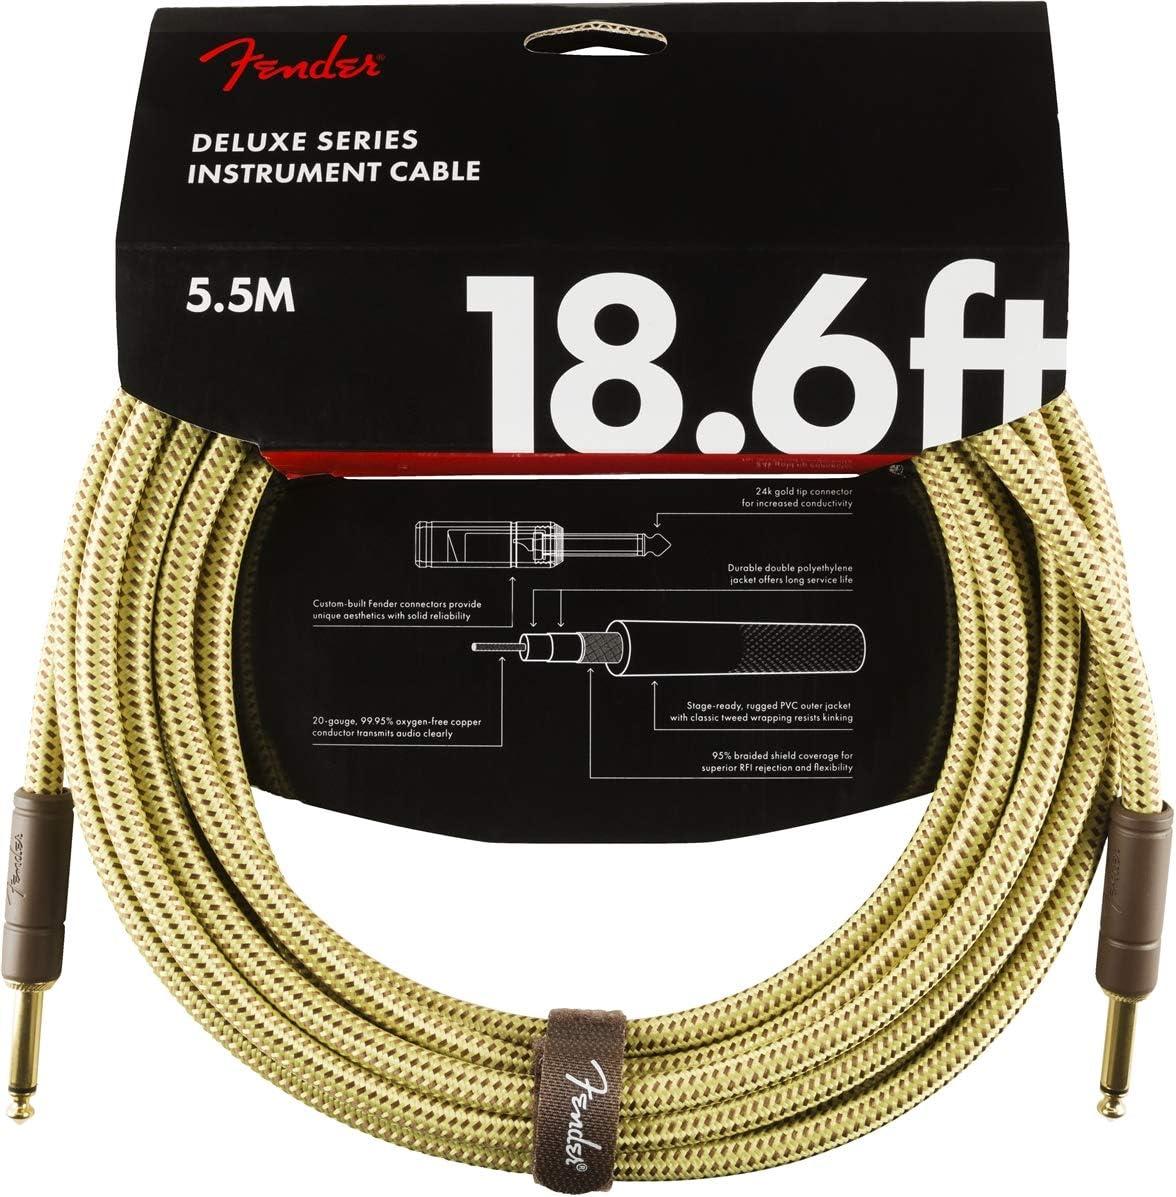 Black Tweed STR//STR 15 ft FENDER Deluxe Series Instrument Cable